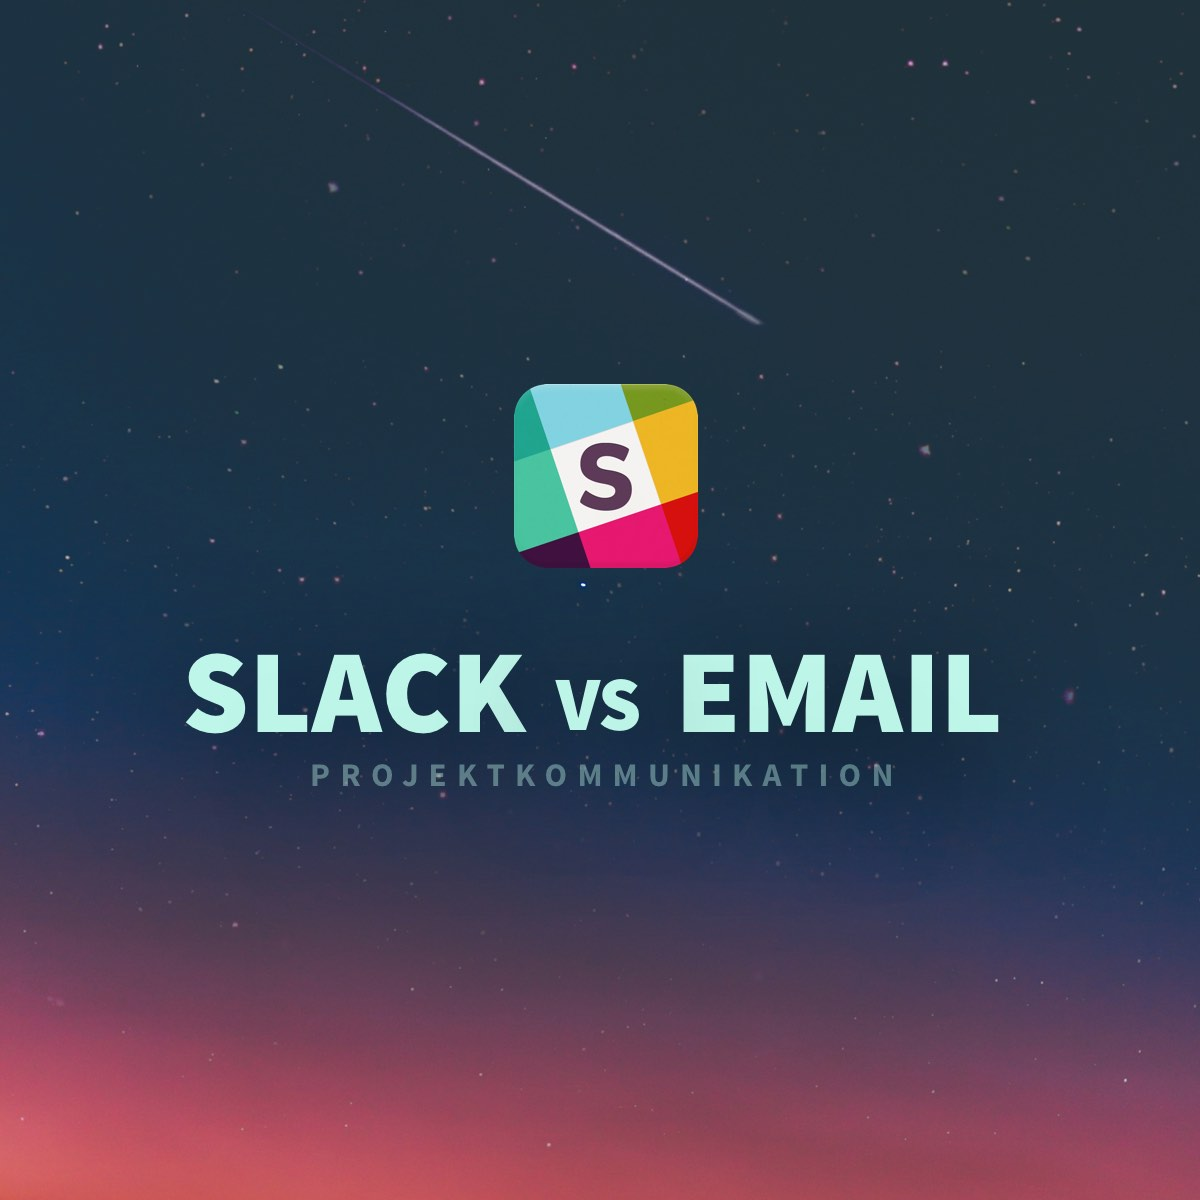 Slack statt E-Mail – die bessere Projektkommunikation für Kreativ-Teams?